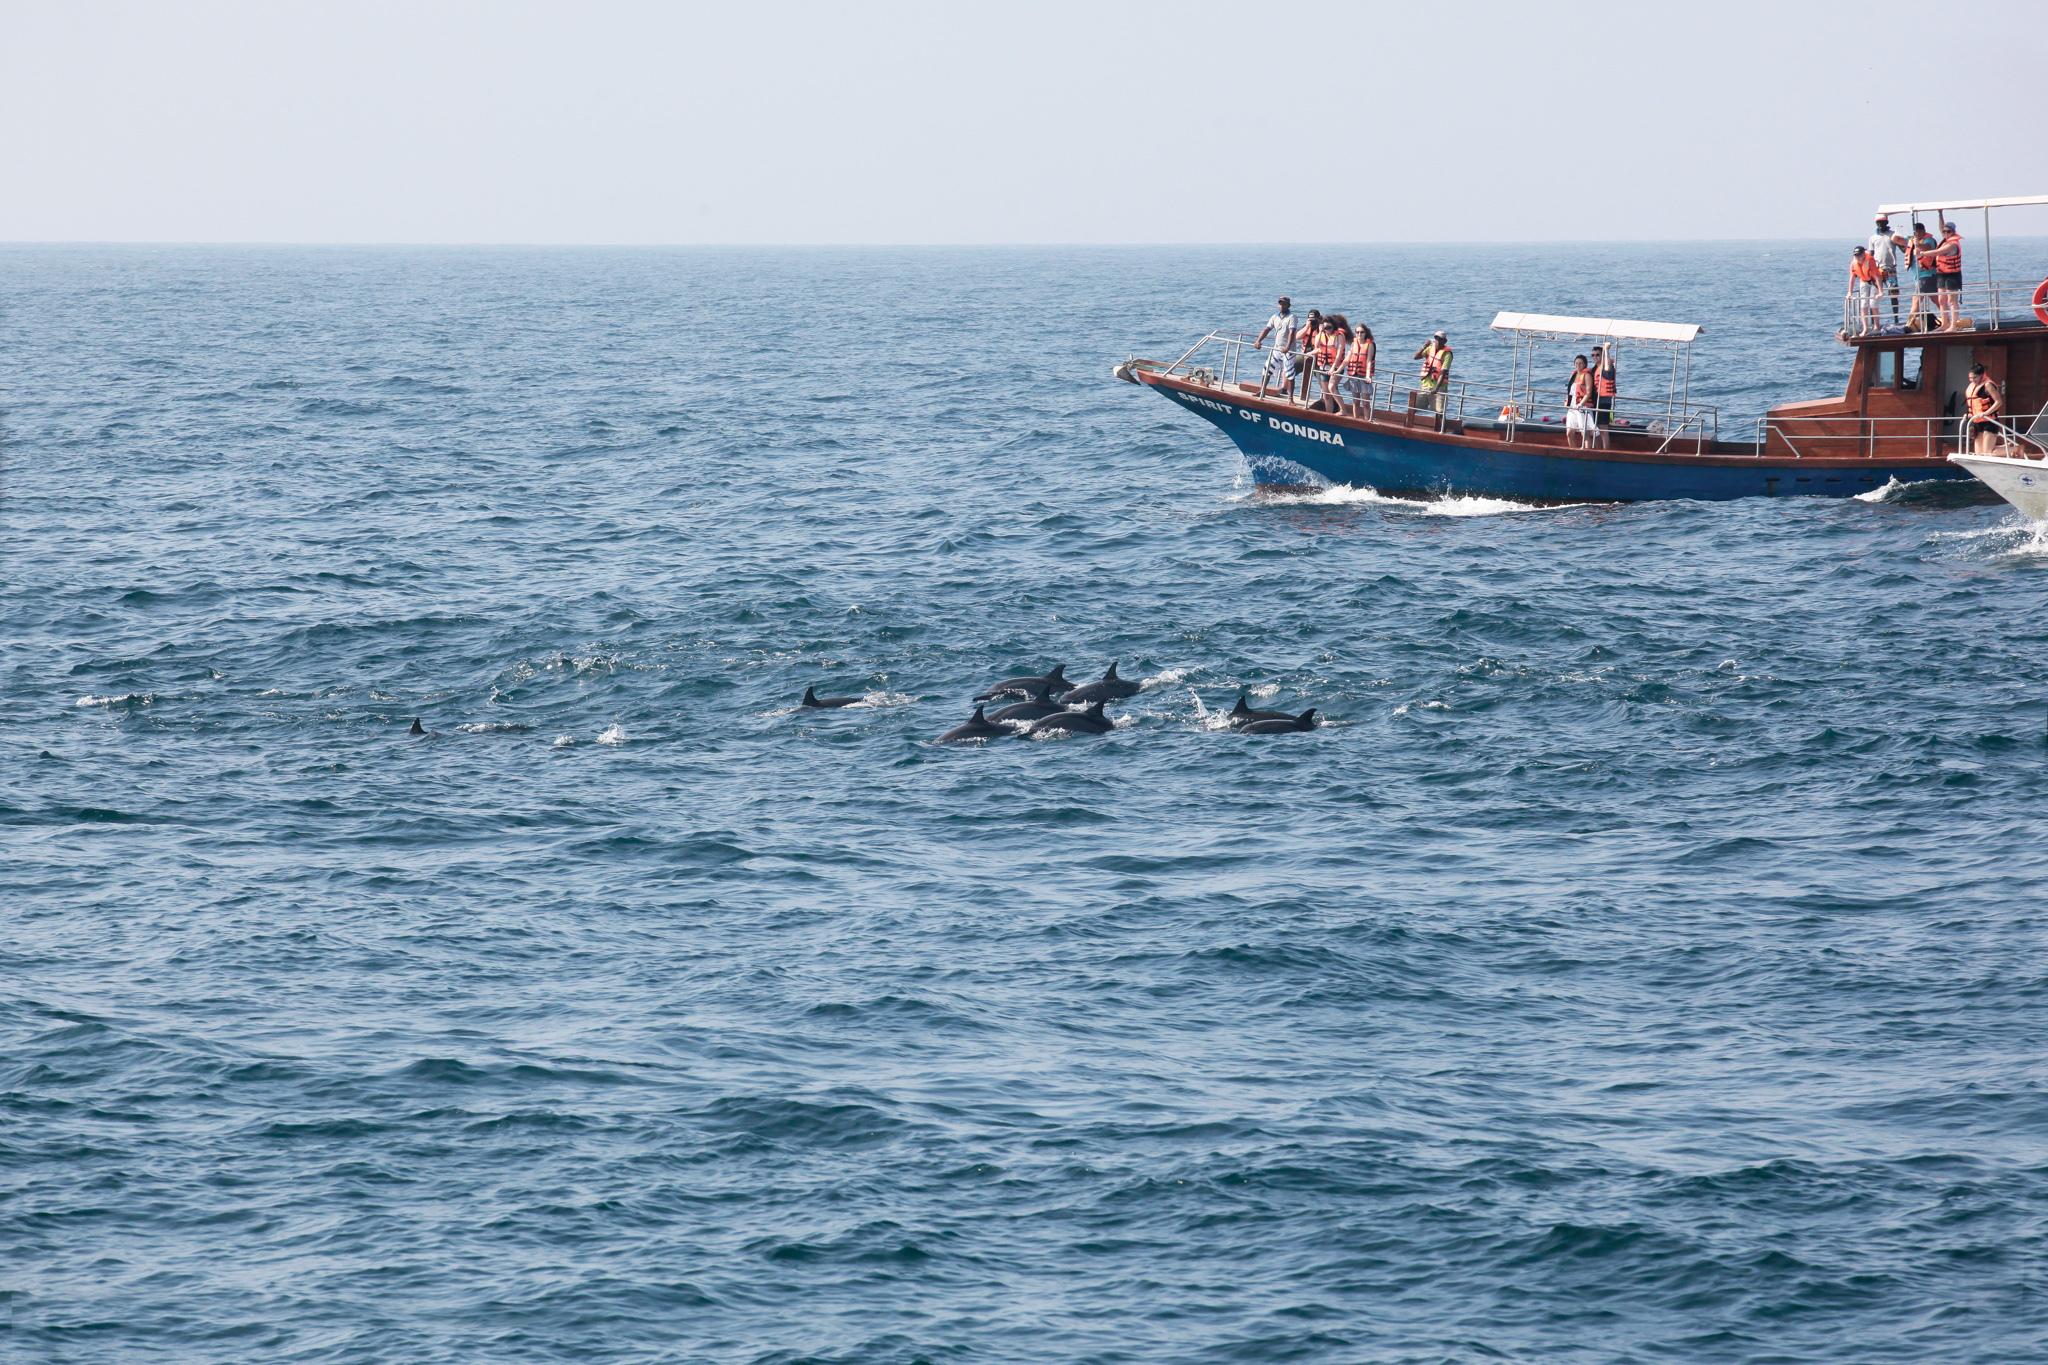 Whale watching in Mirissa and Kalpitiya